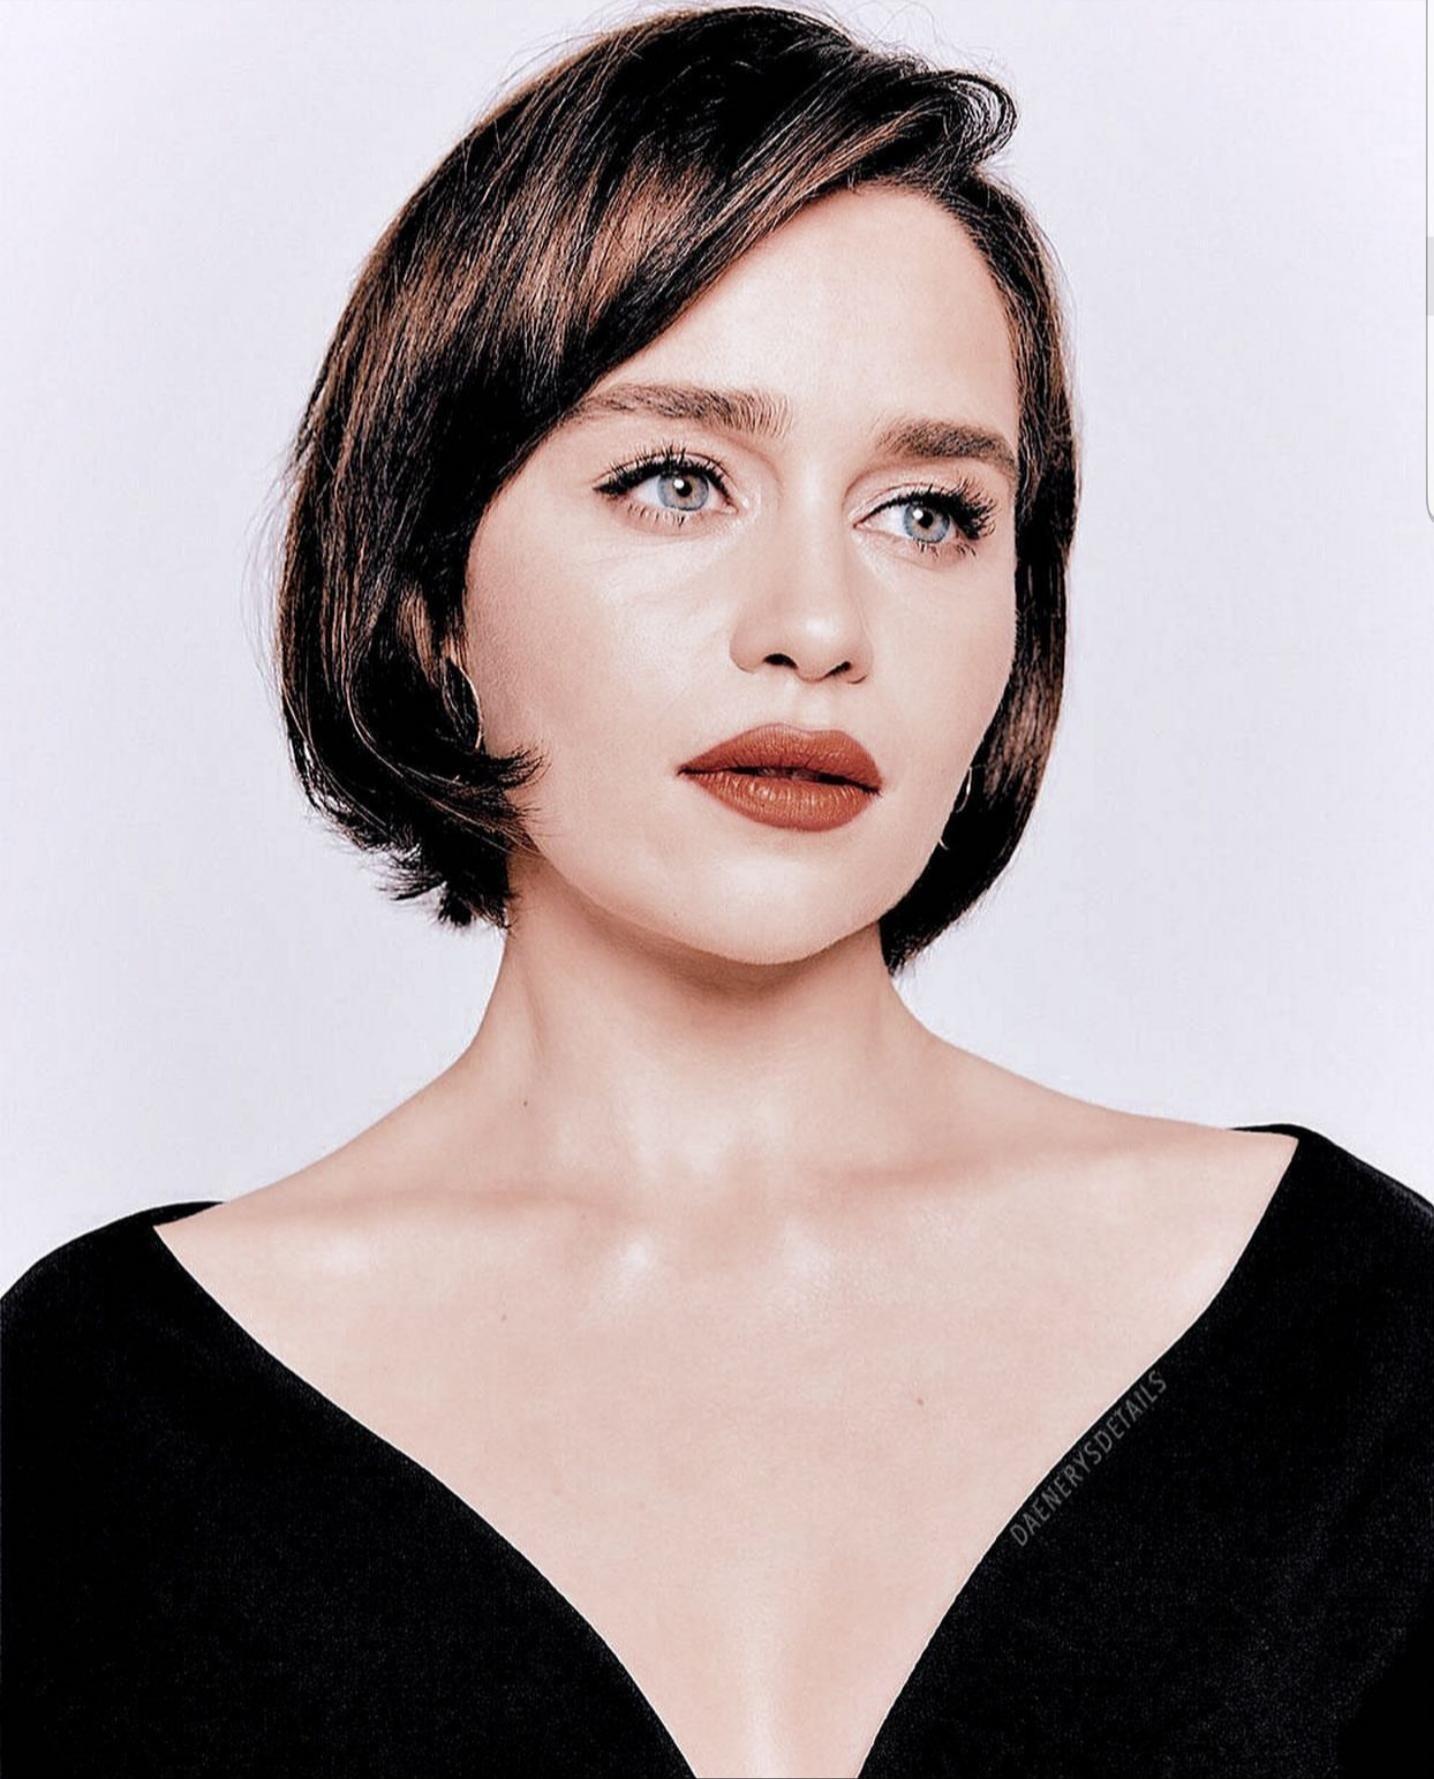 Pin By Asala Alhelaly On Emilia Clarke Emilia Clarke Short Hair Styles Portrait